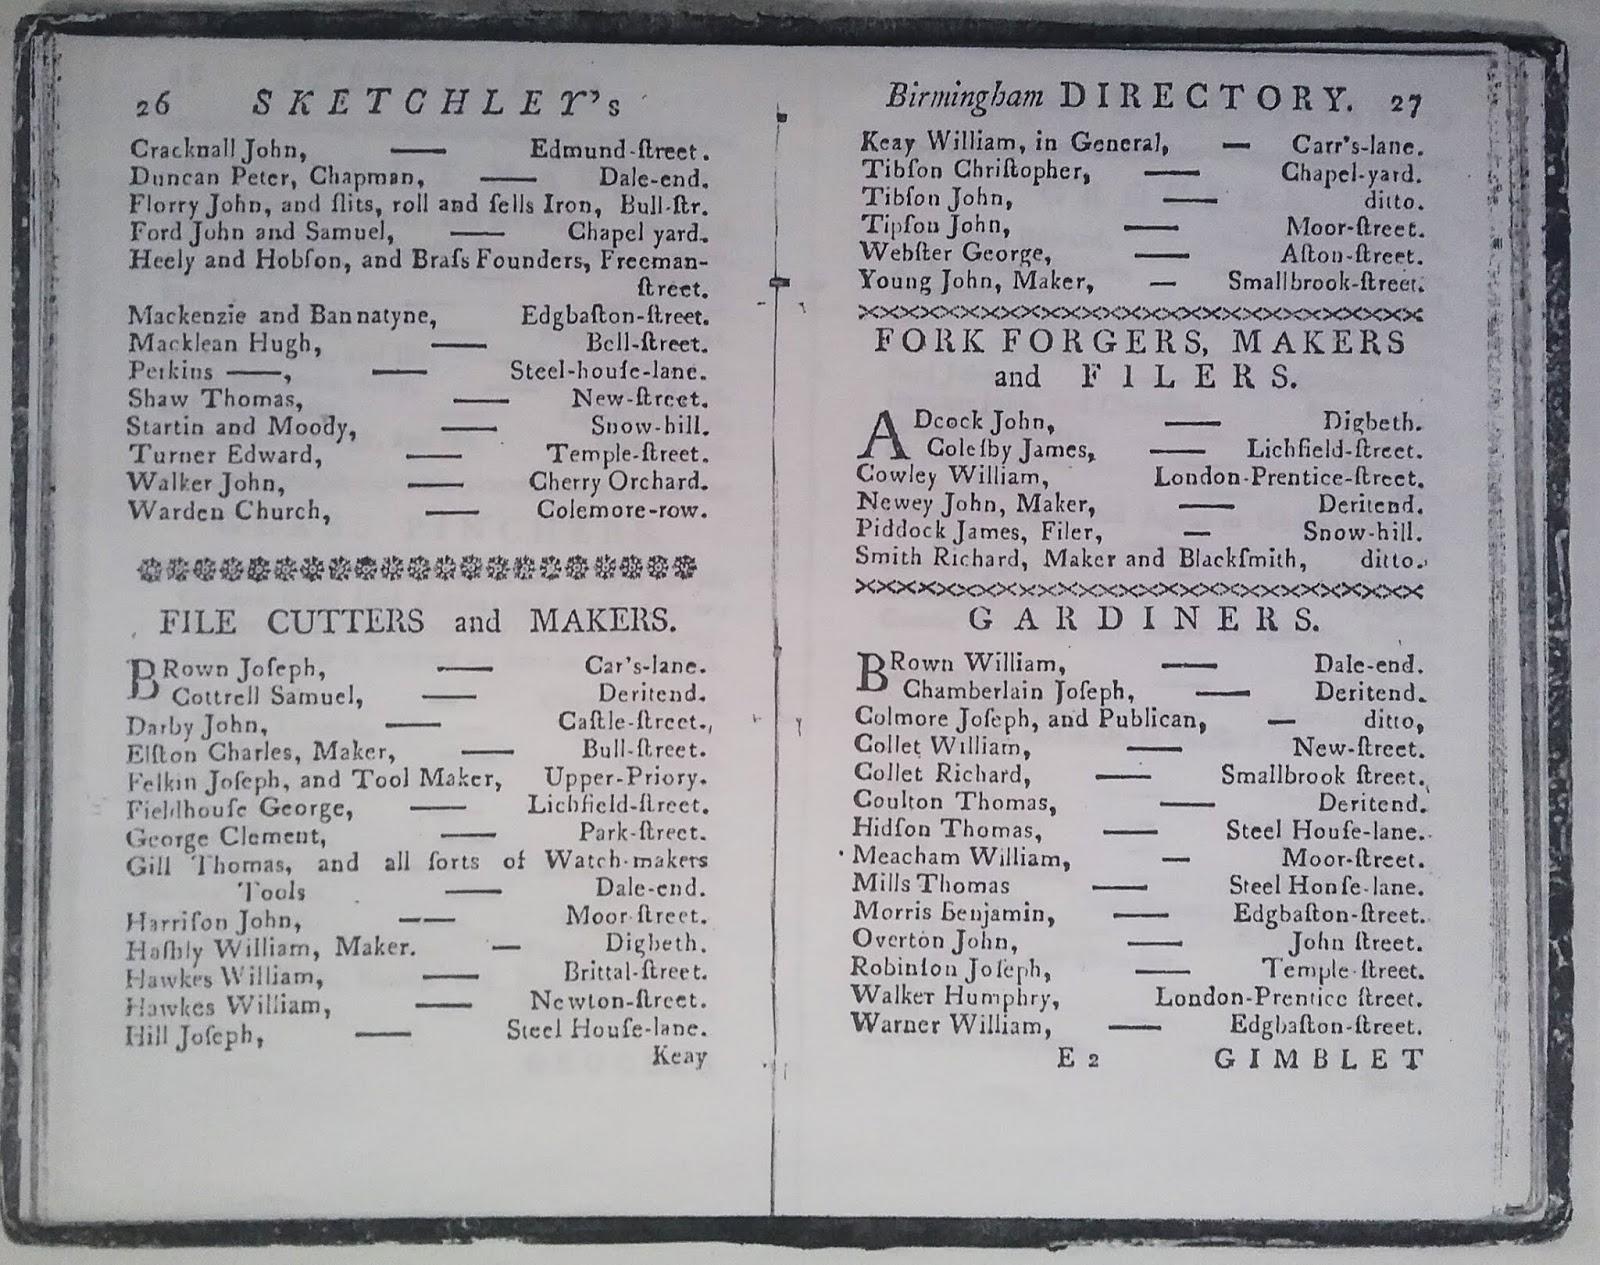 Eighteenth Century Birmingham: 1767 Sketchley Directory